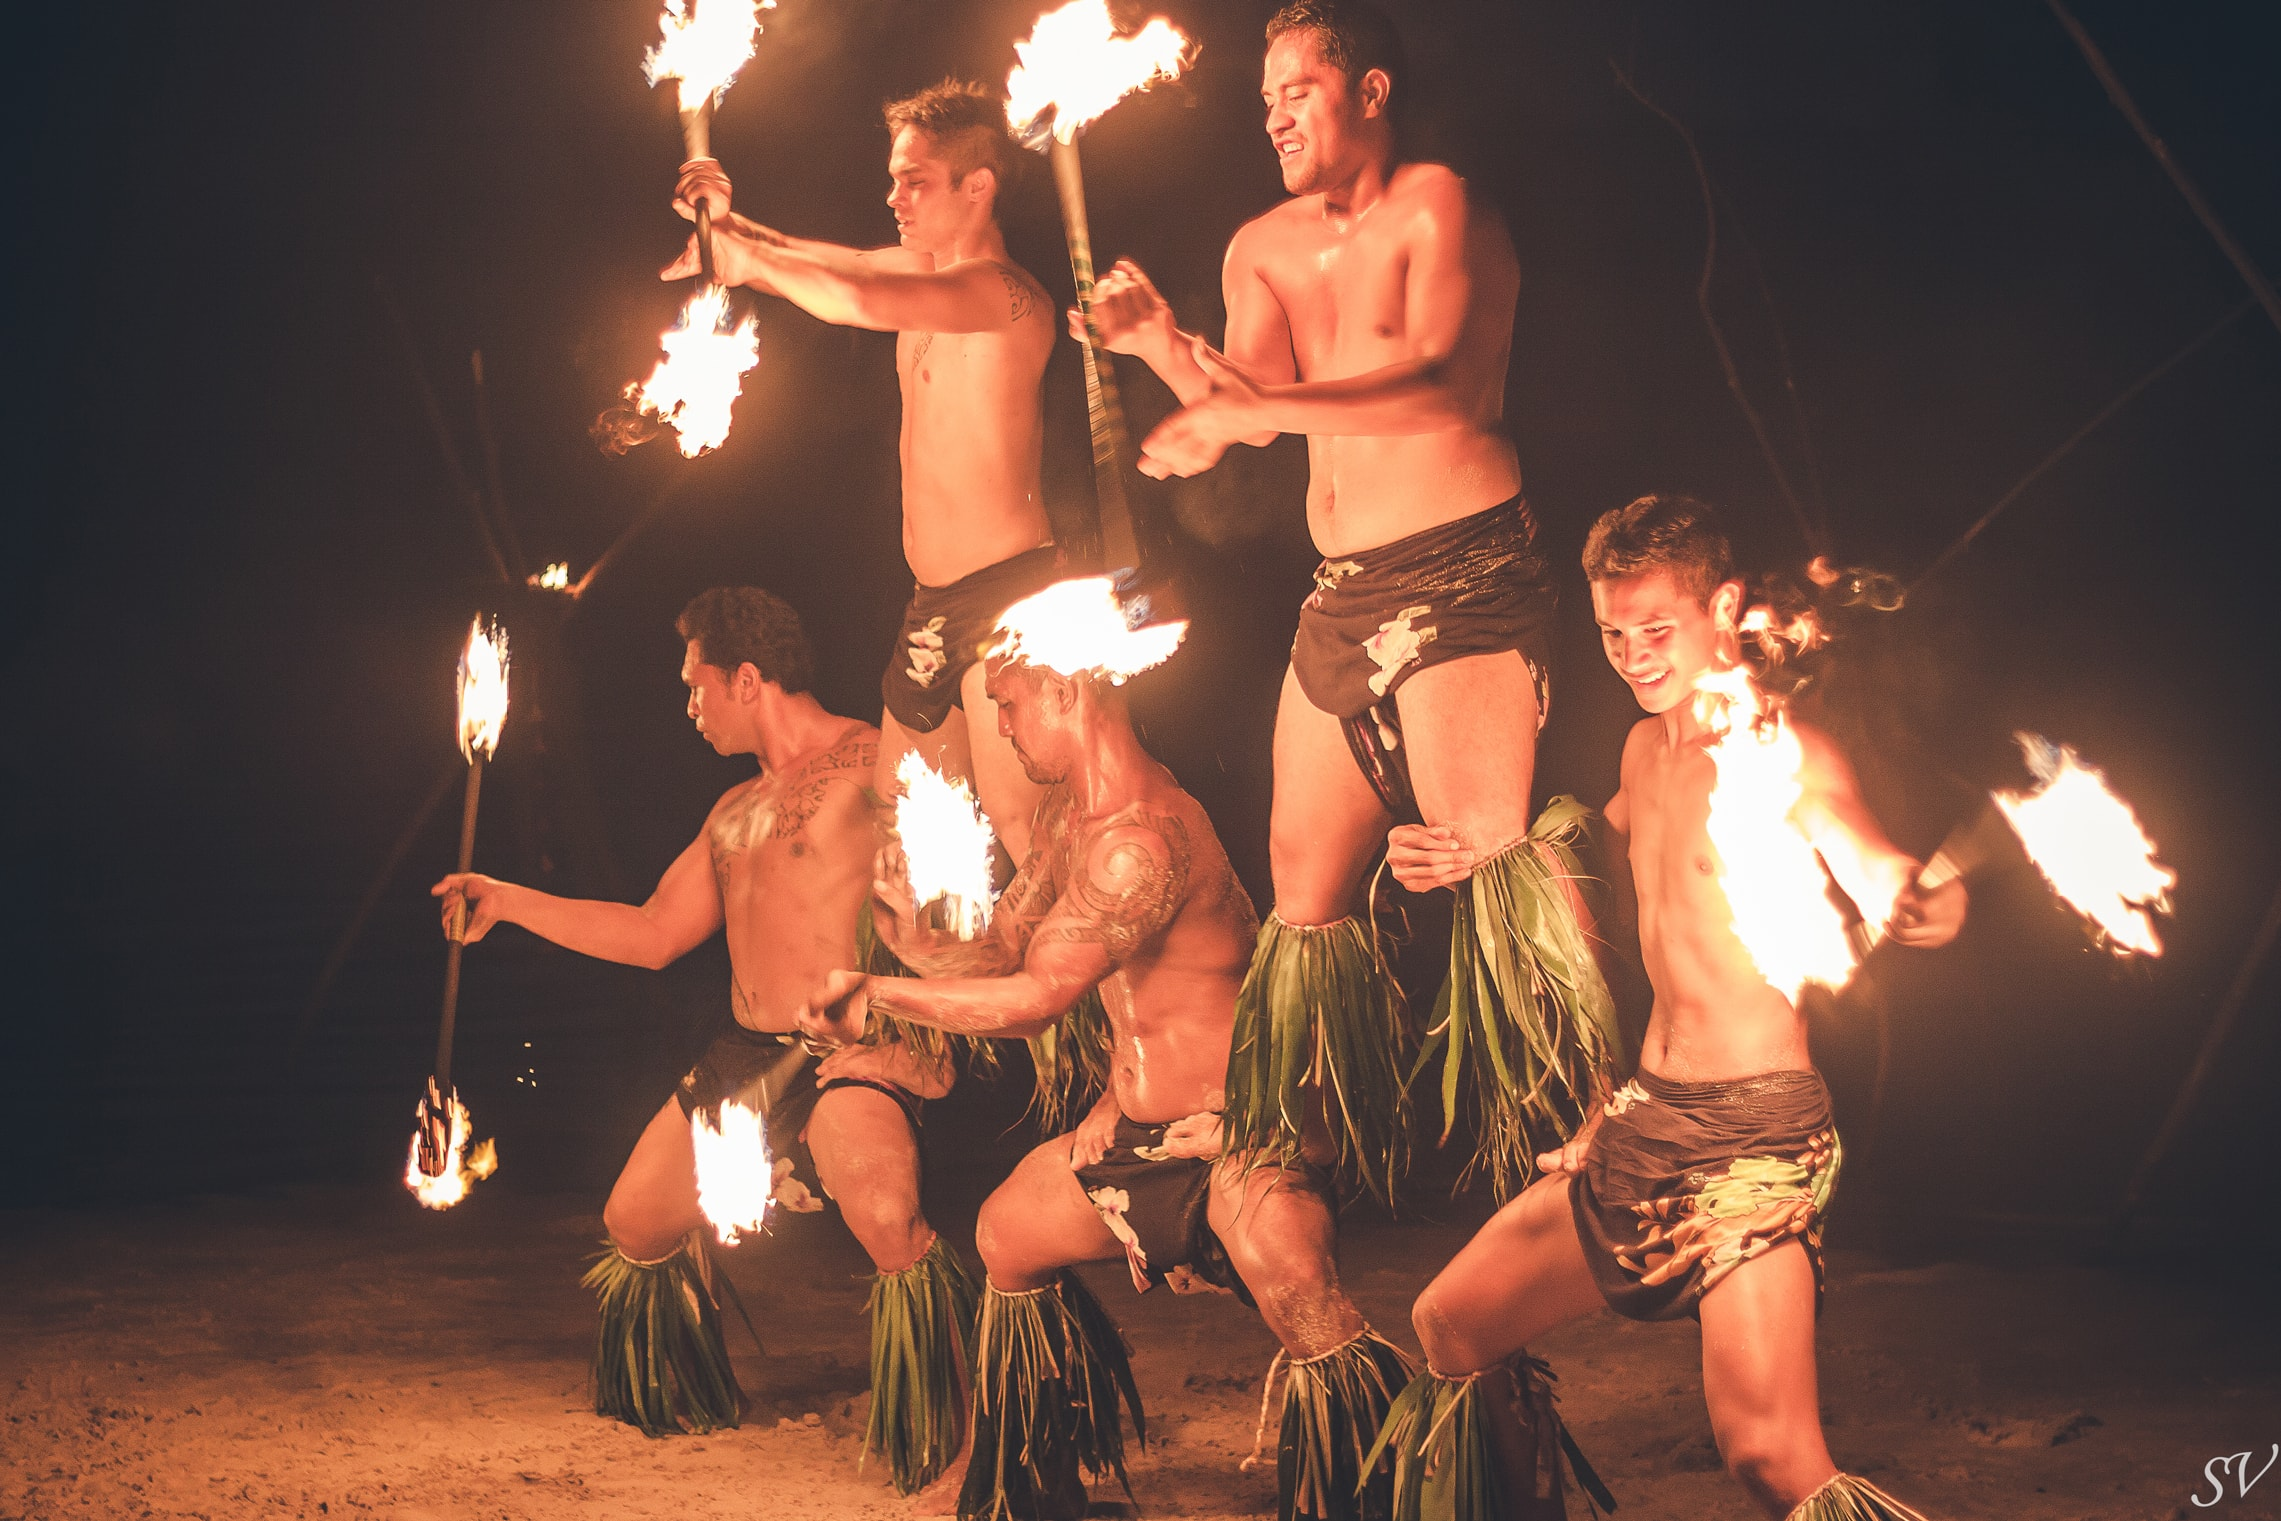 Fire Polynesian dancer during a wedding in Moorea, Tahiti